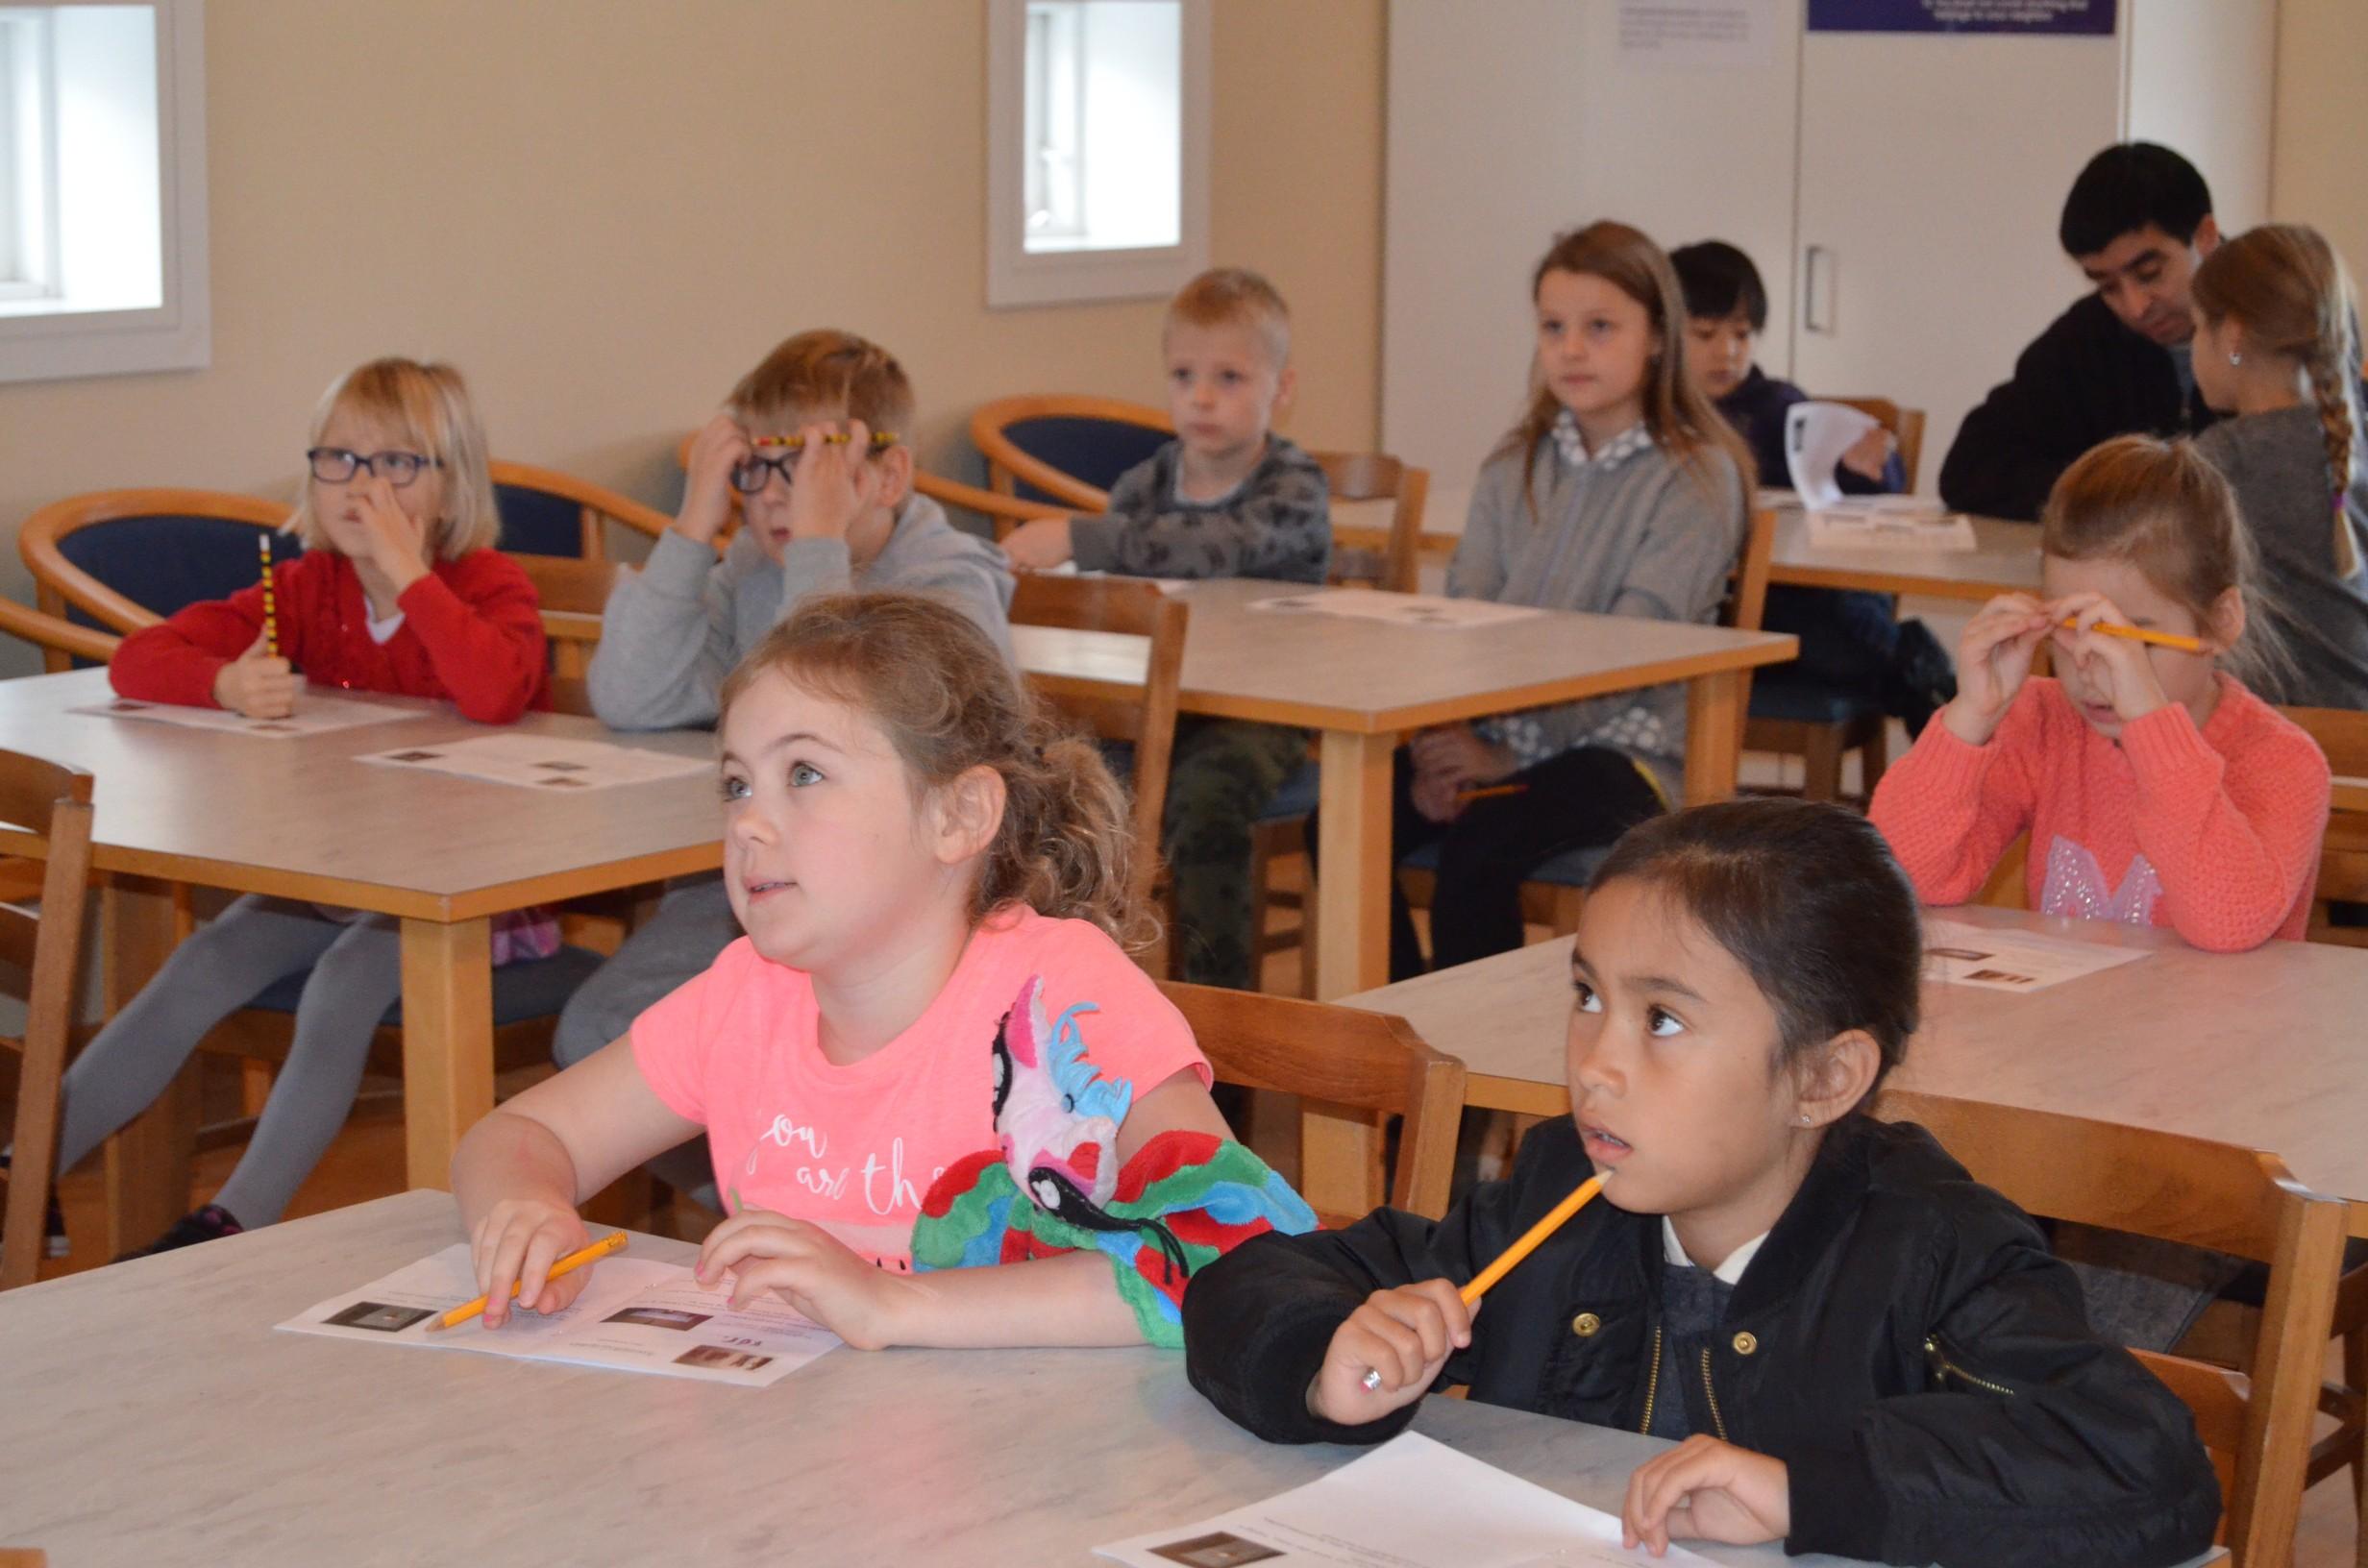 IVE-SSVM-Retreat-Comunion-kids-Iceland1